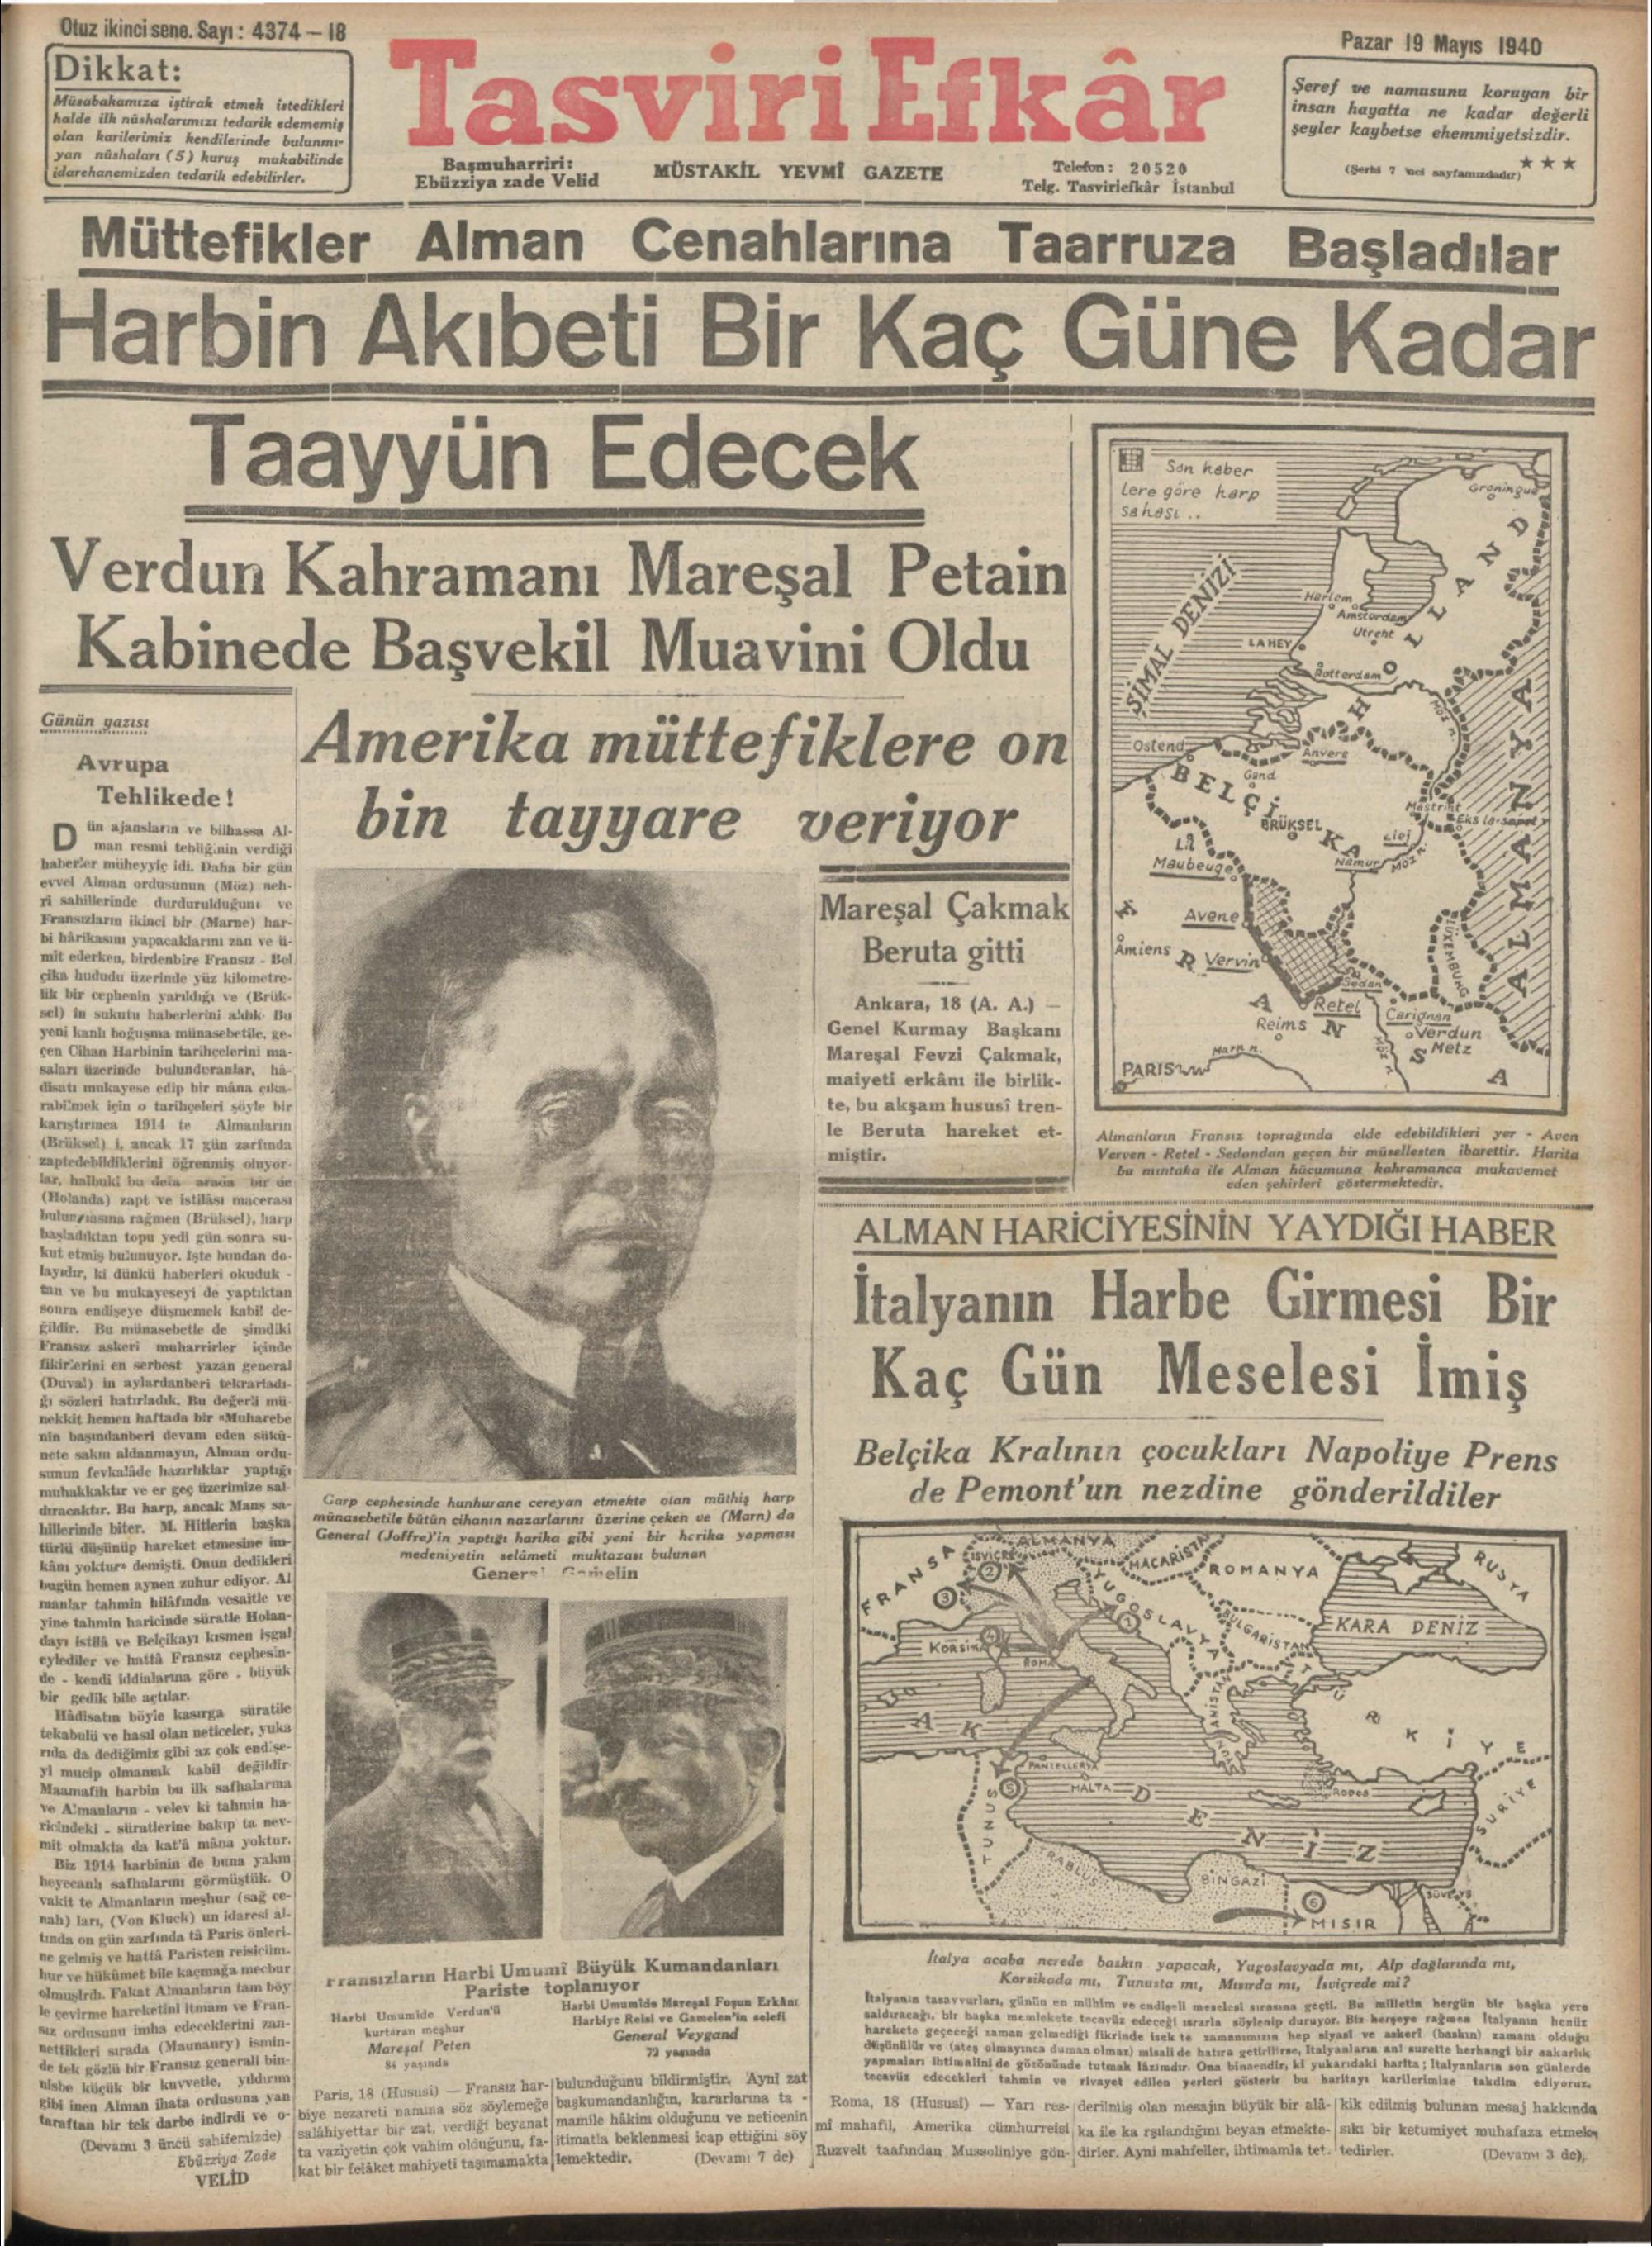 19 Mayıs 1940 Tarihli Tasviri Efkar Gazetesi Sayfa 1